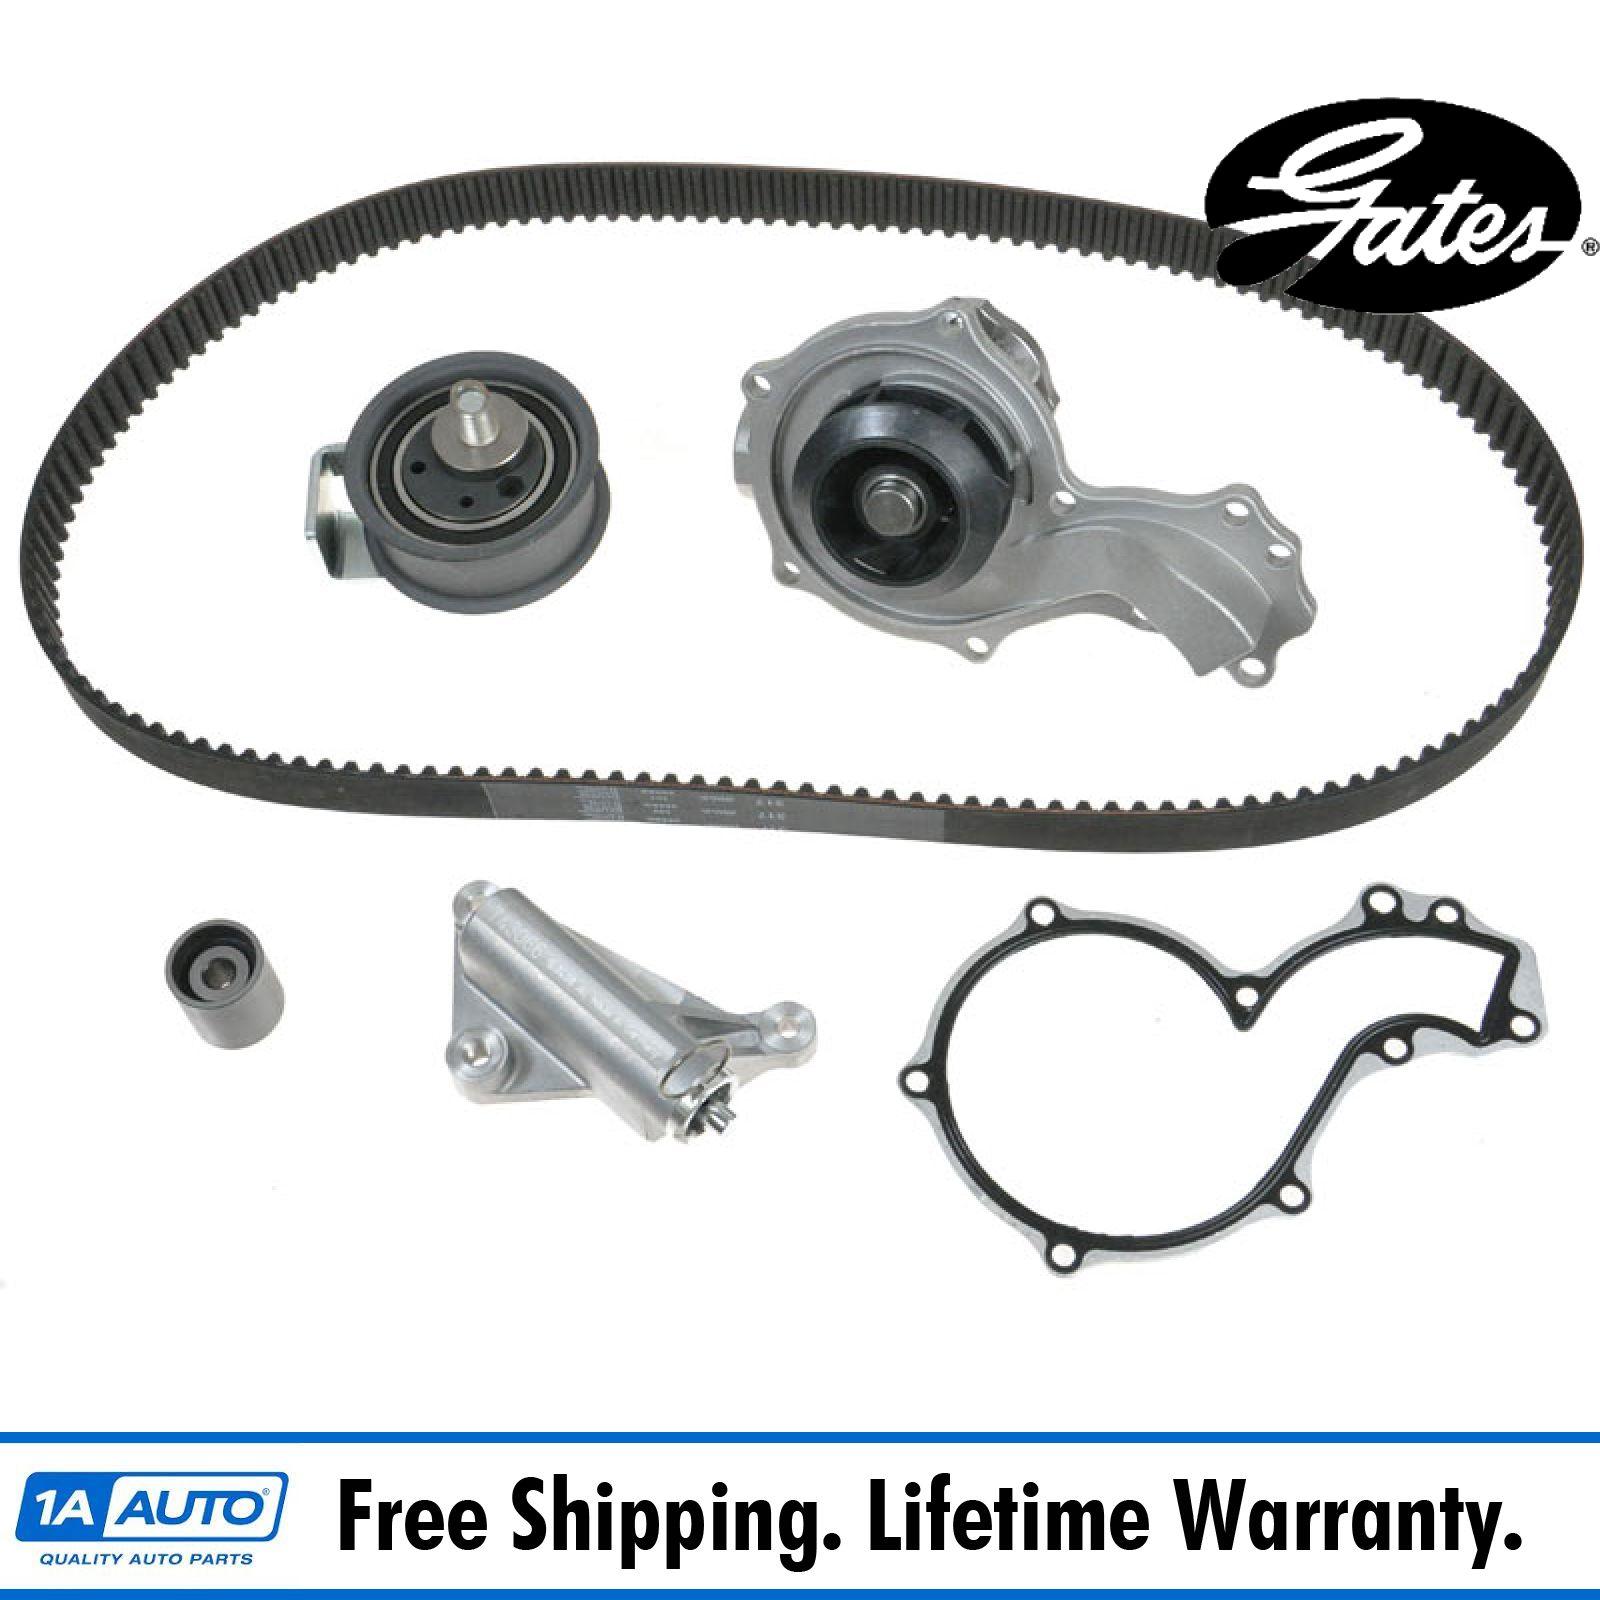 AUDI S3 8L 1.8 Timing Belt /& Water Pump Kit 99 to 03 Set Gates Quality New